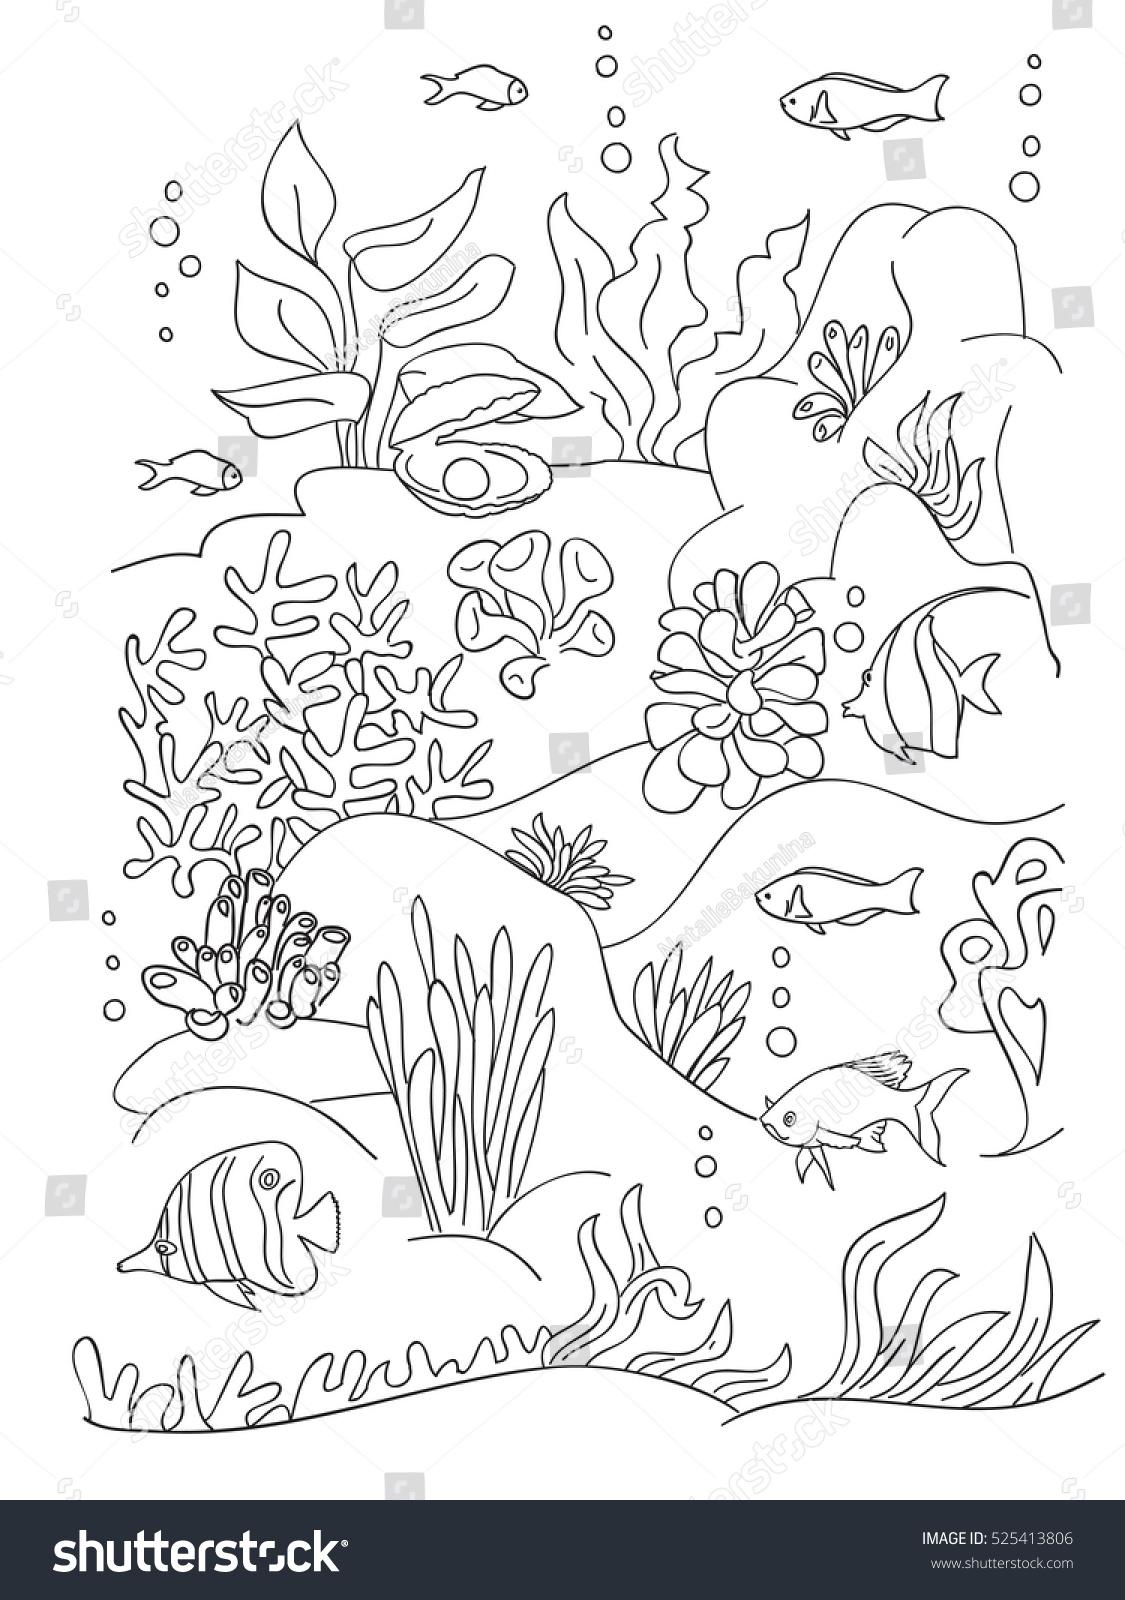 seaweed coloring pages eliolera com